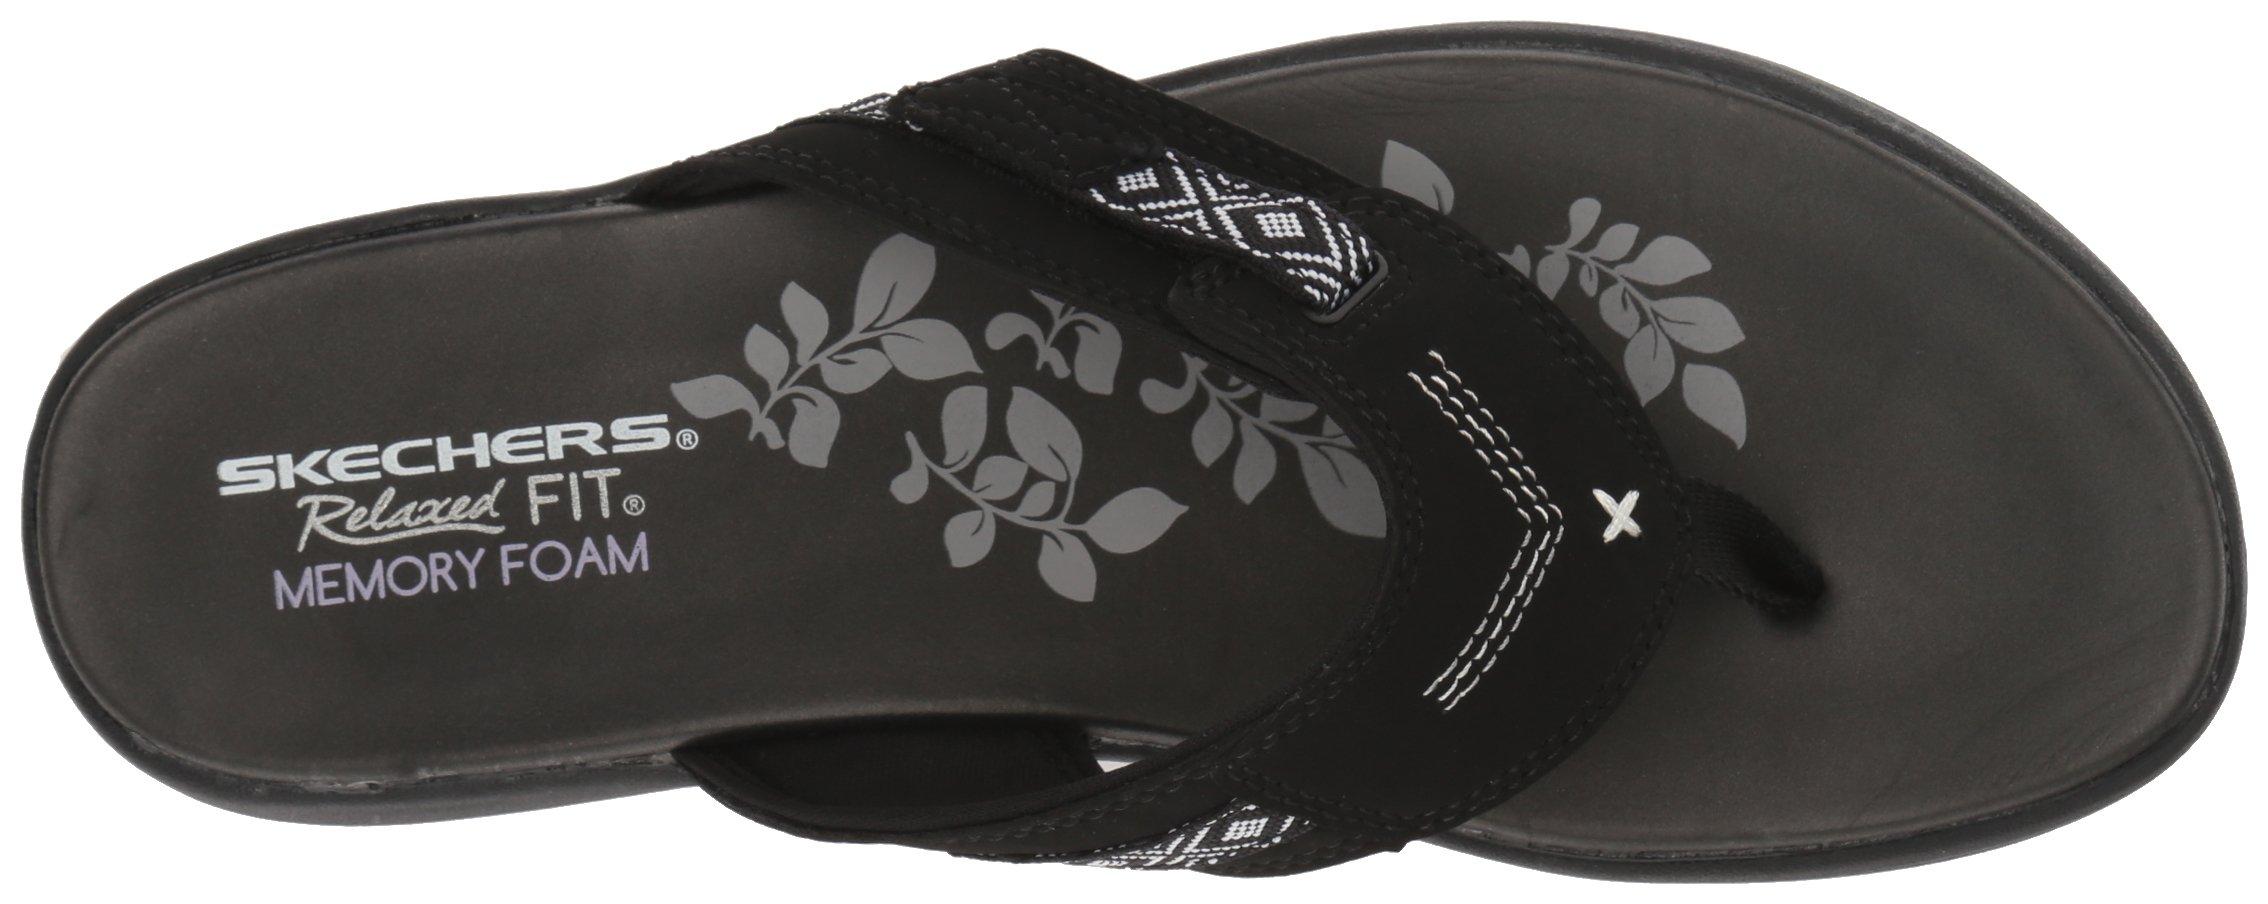 Skechers Modern Comfort Sandals Women's Upgrades Marina Bay Flip Flop Black/White, 8 M US by Skechers (Image #8)